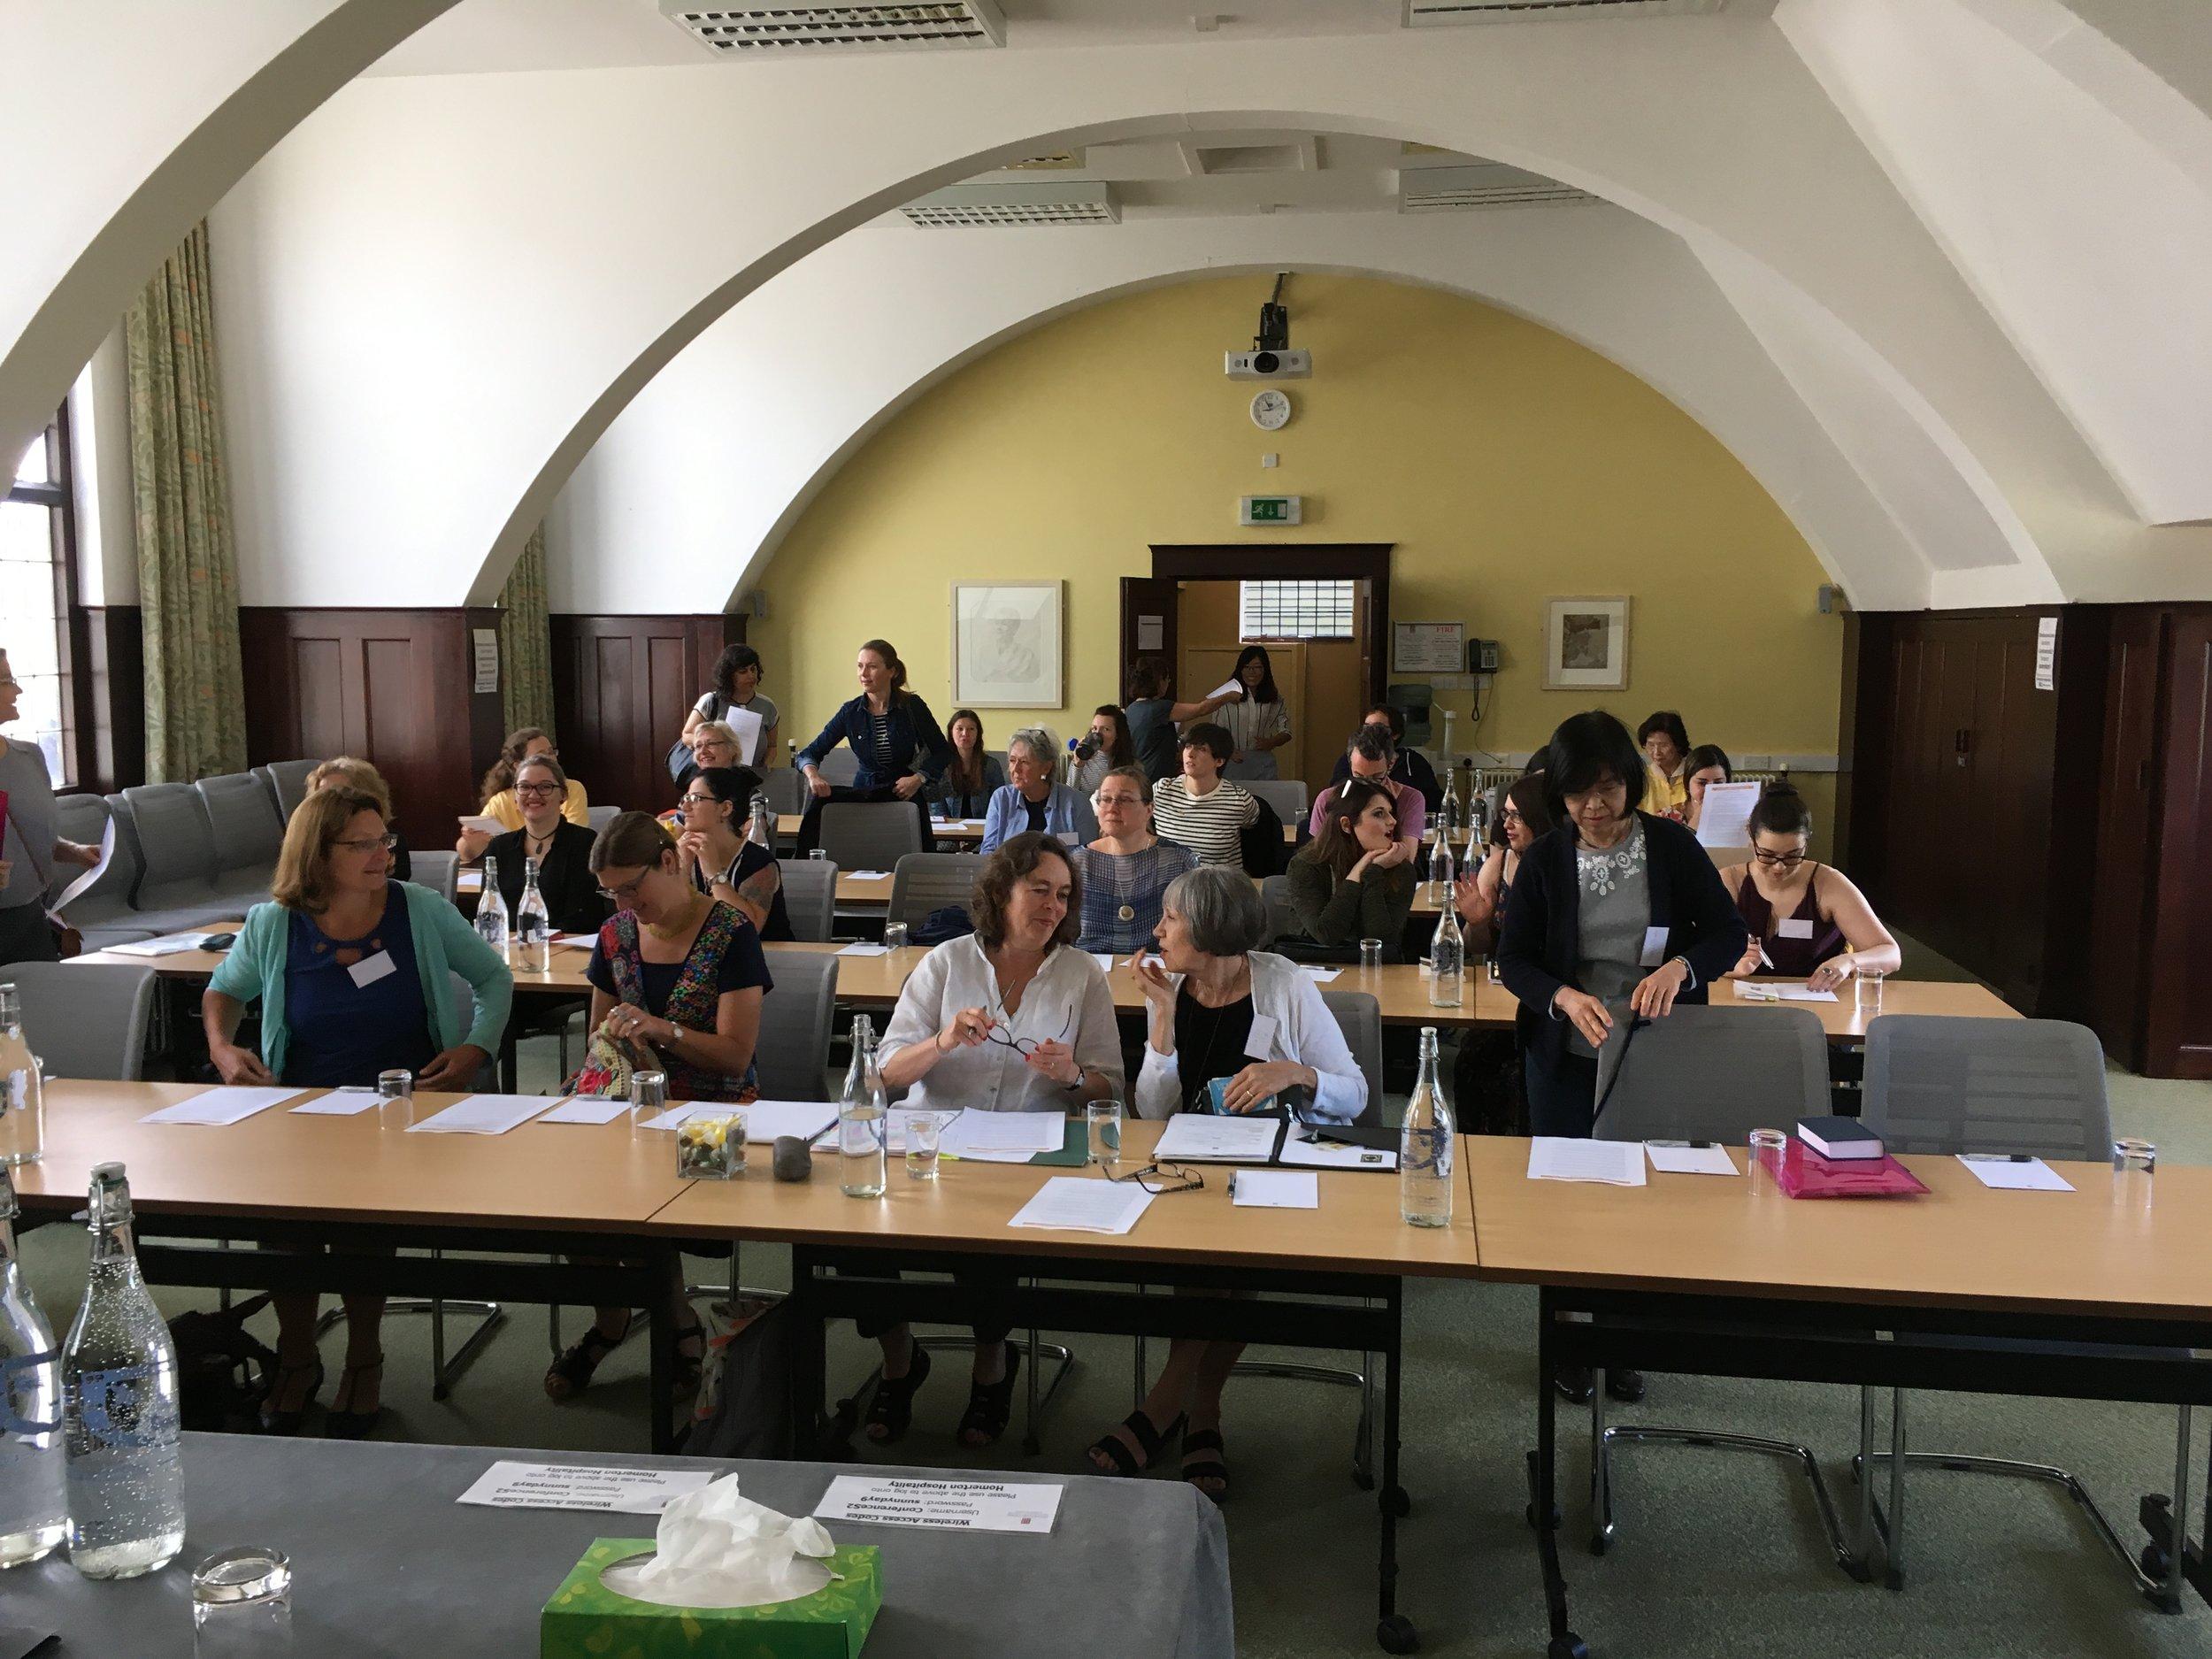 VW lecture PB room*.JPG